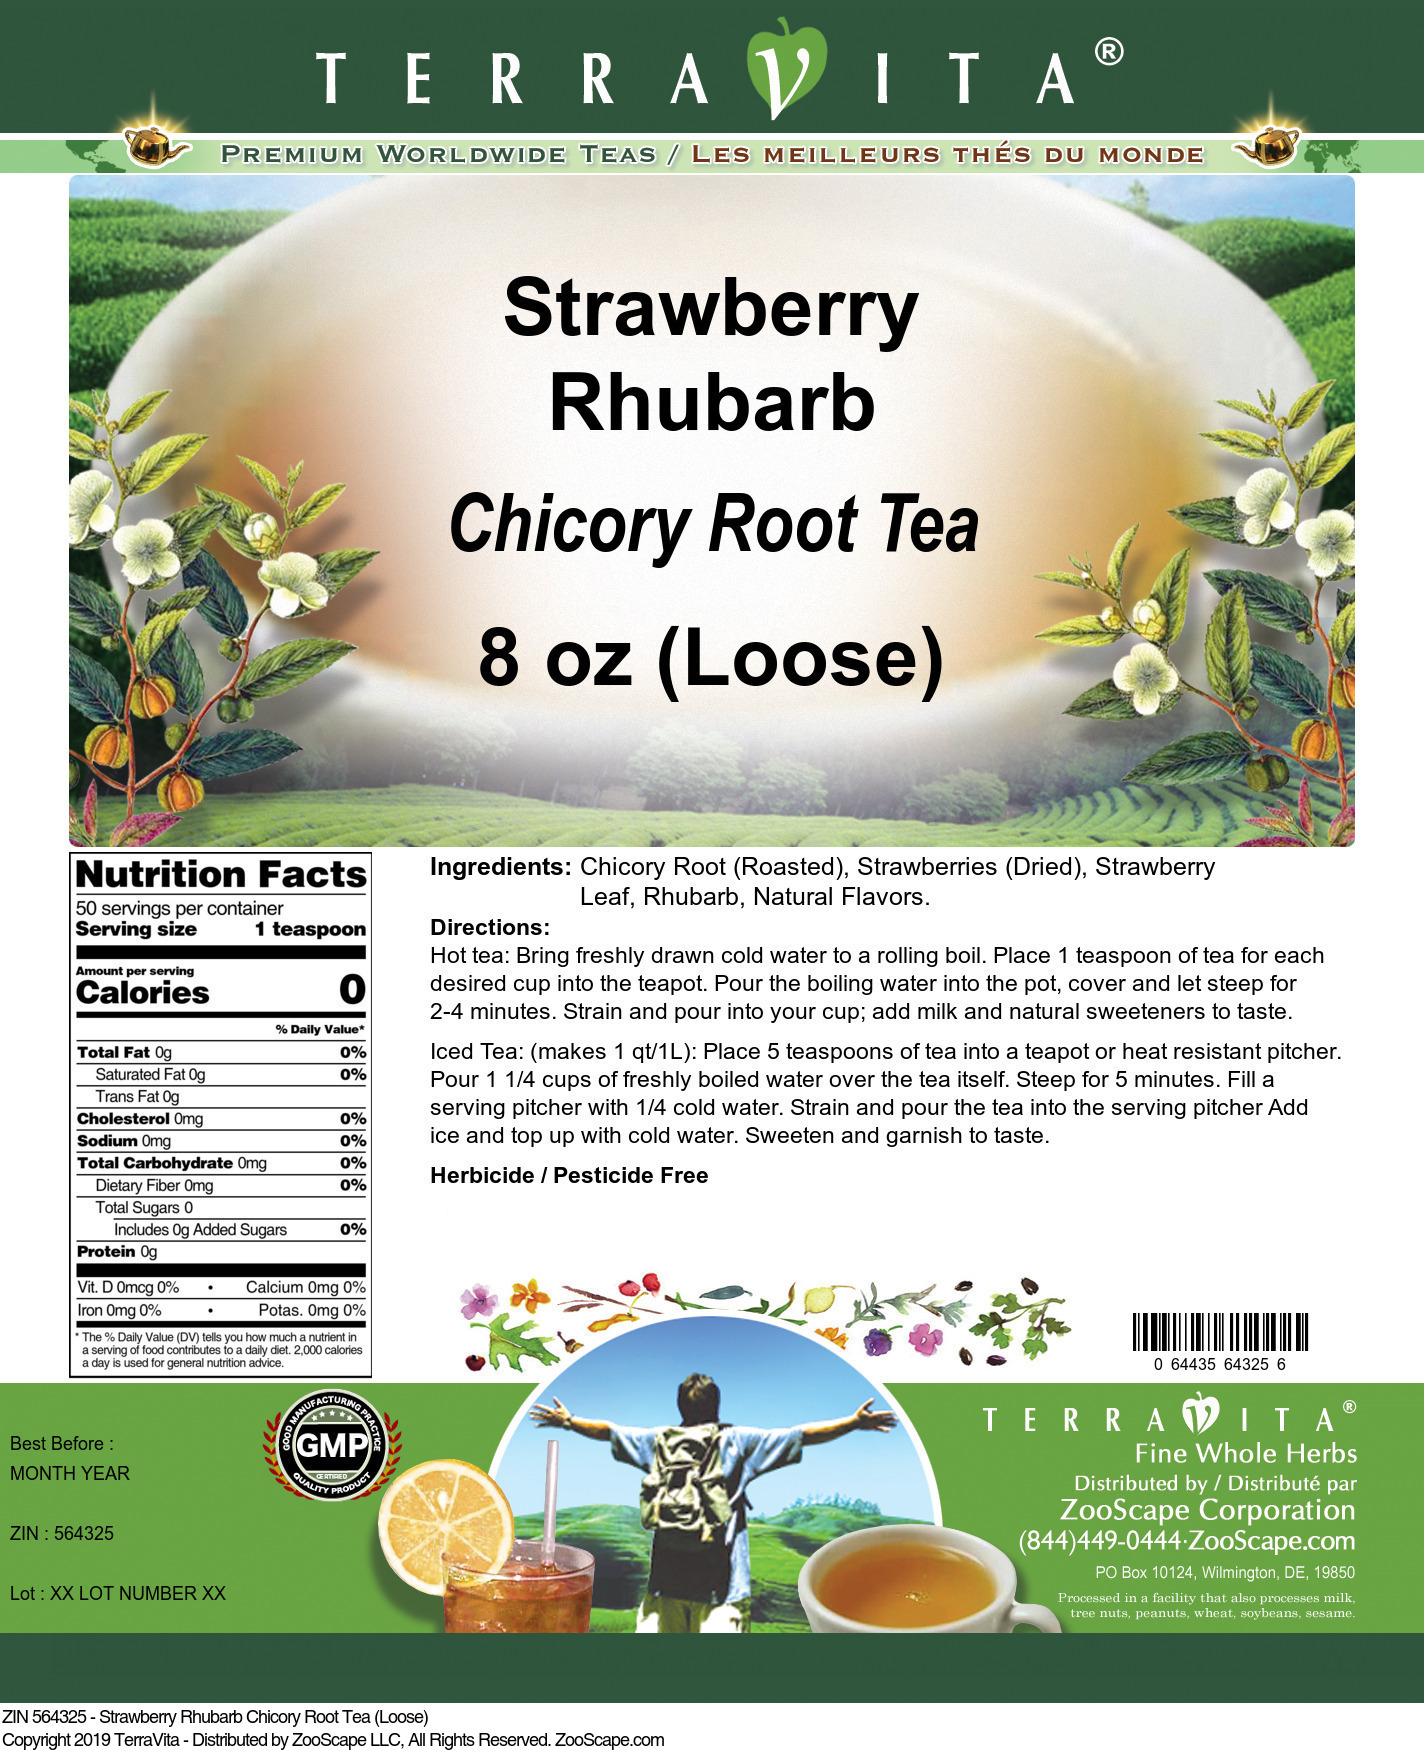 Strawberry Rhubarb Chicory Root Tea (Loose)